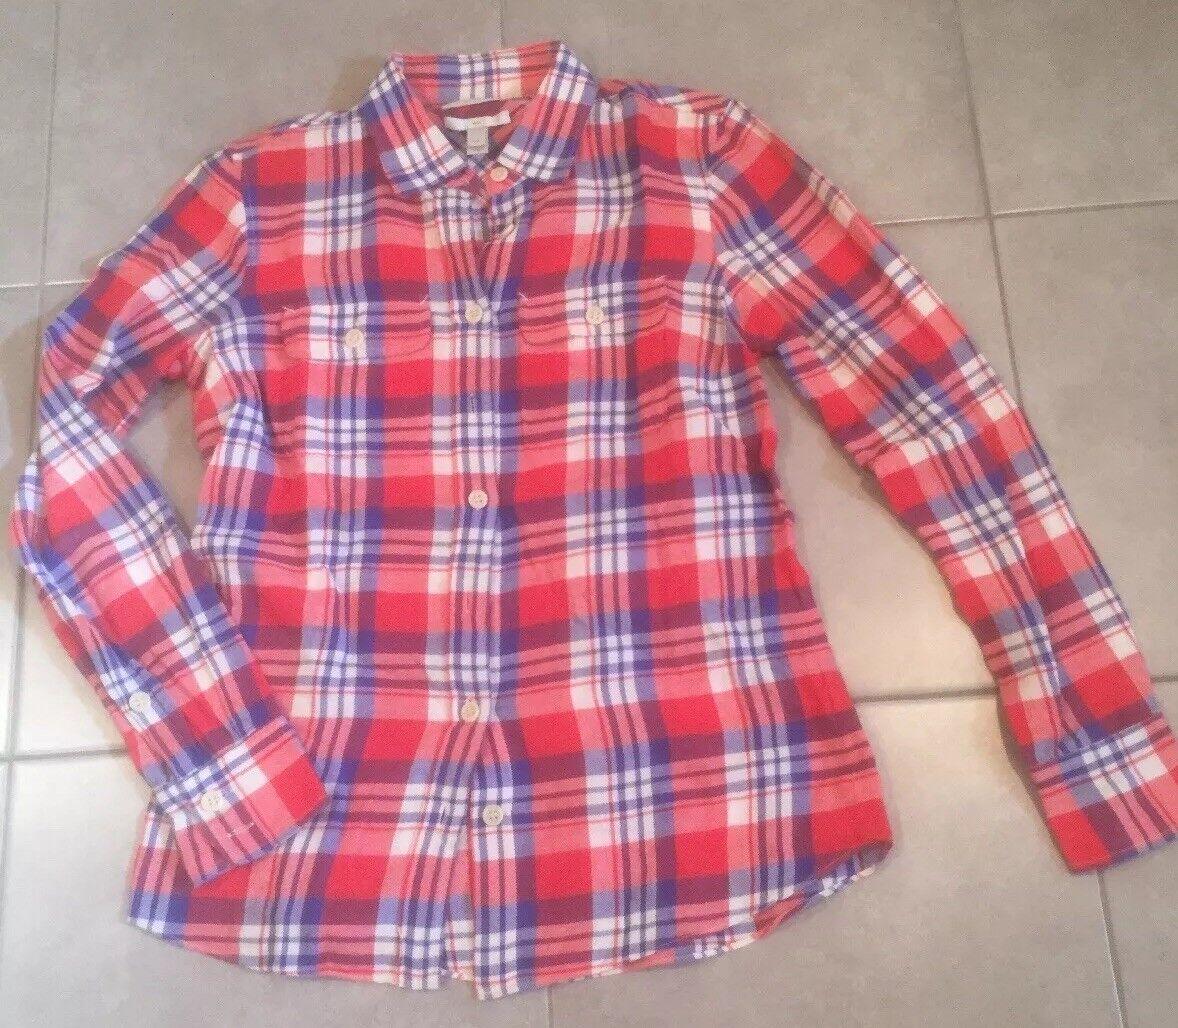 J CREW Woherren Plaid Button Down Shirt Größe 00 Blouse